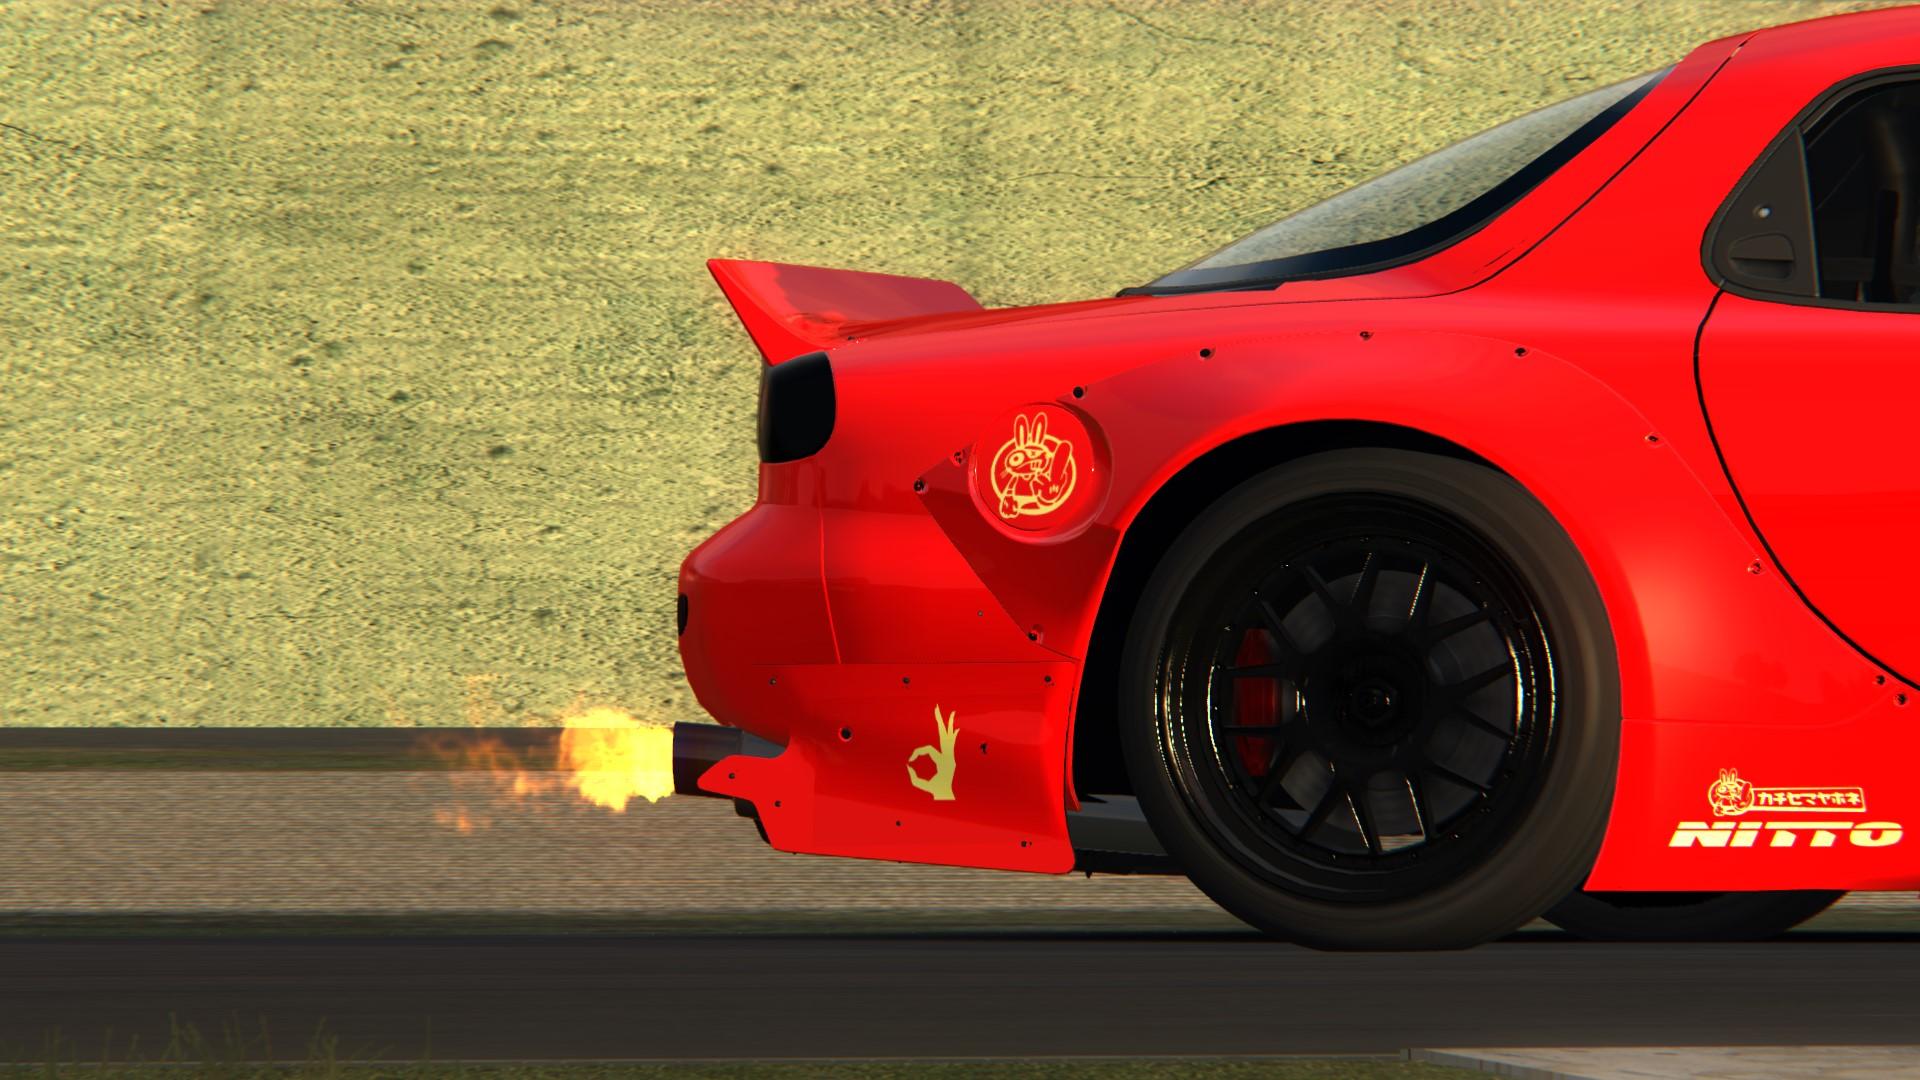 Screenshot_hp_rx7_fd3s_rocketbunny_ks_vallelunga_6-11-116-14-55-15.jpg